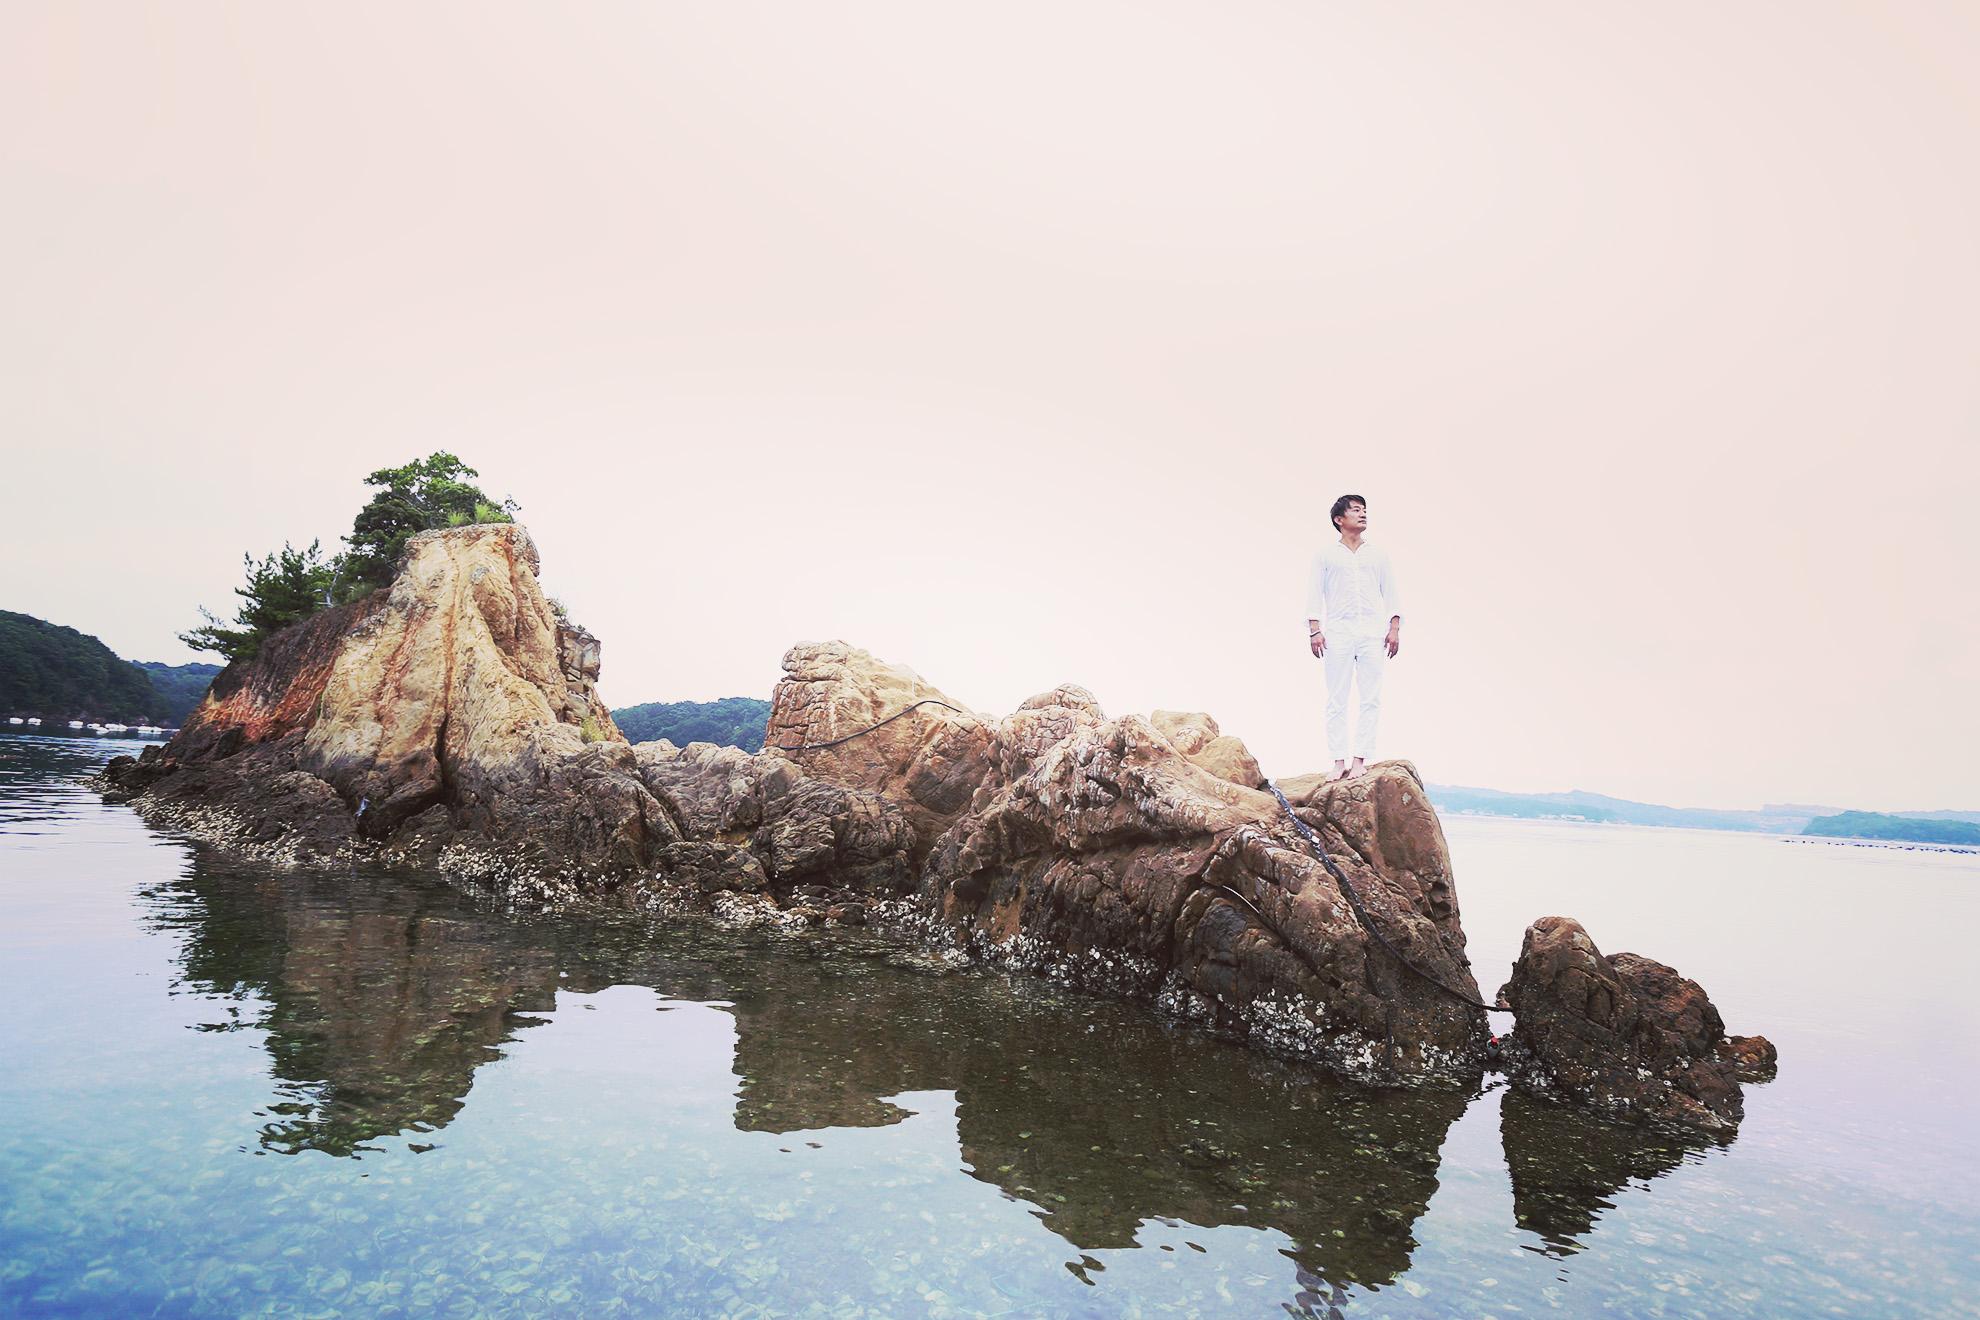 takashi deguchi |出口崇|PEARL FAR EAST04